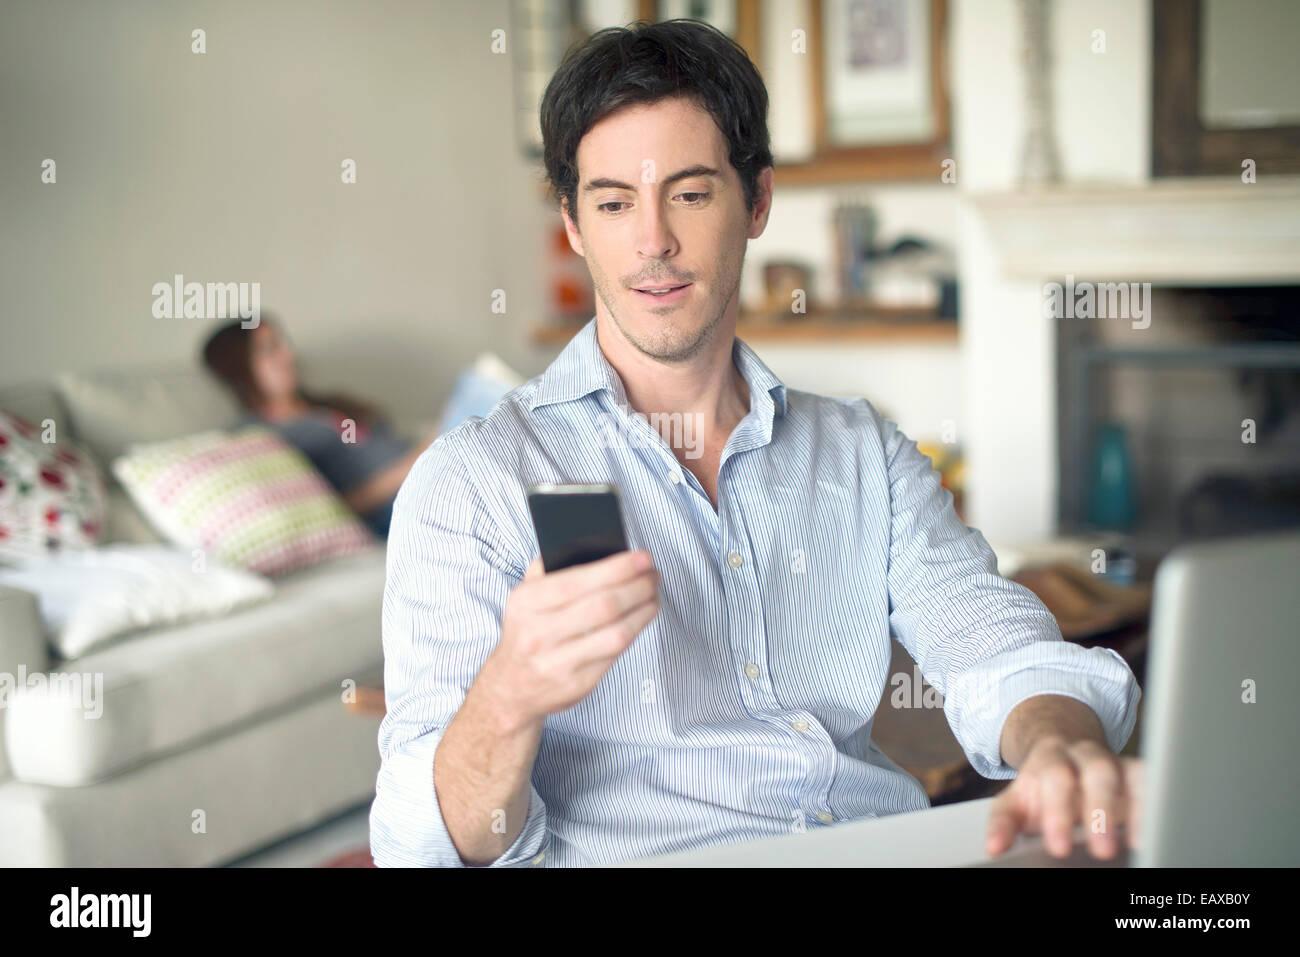 Hombre mirando el teléfono celular Imagen De Stock